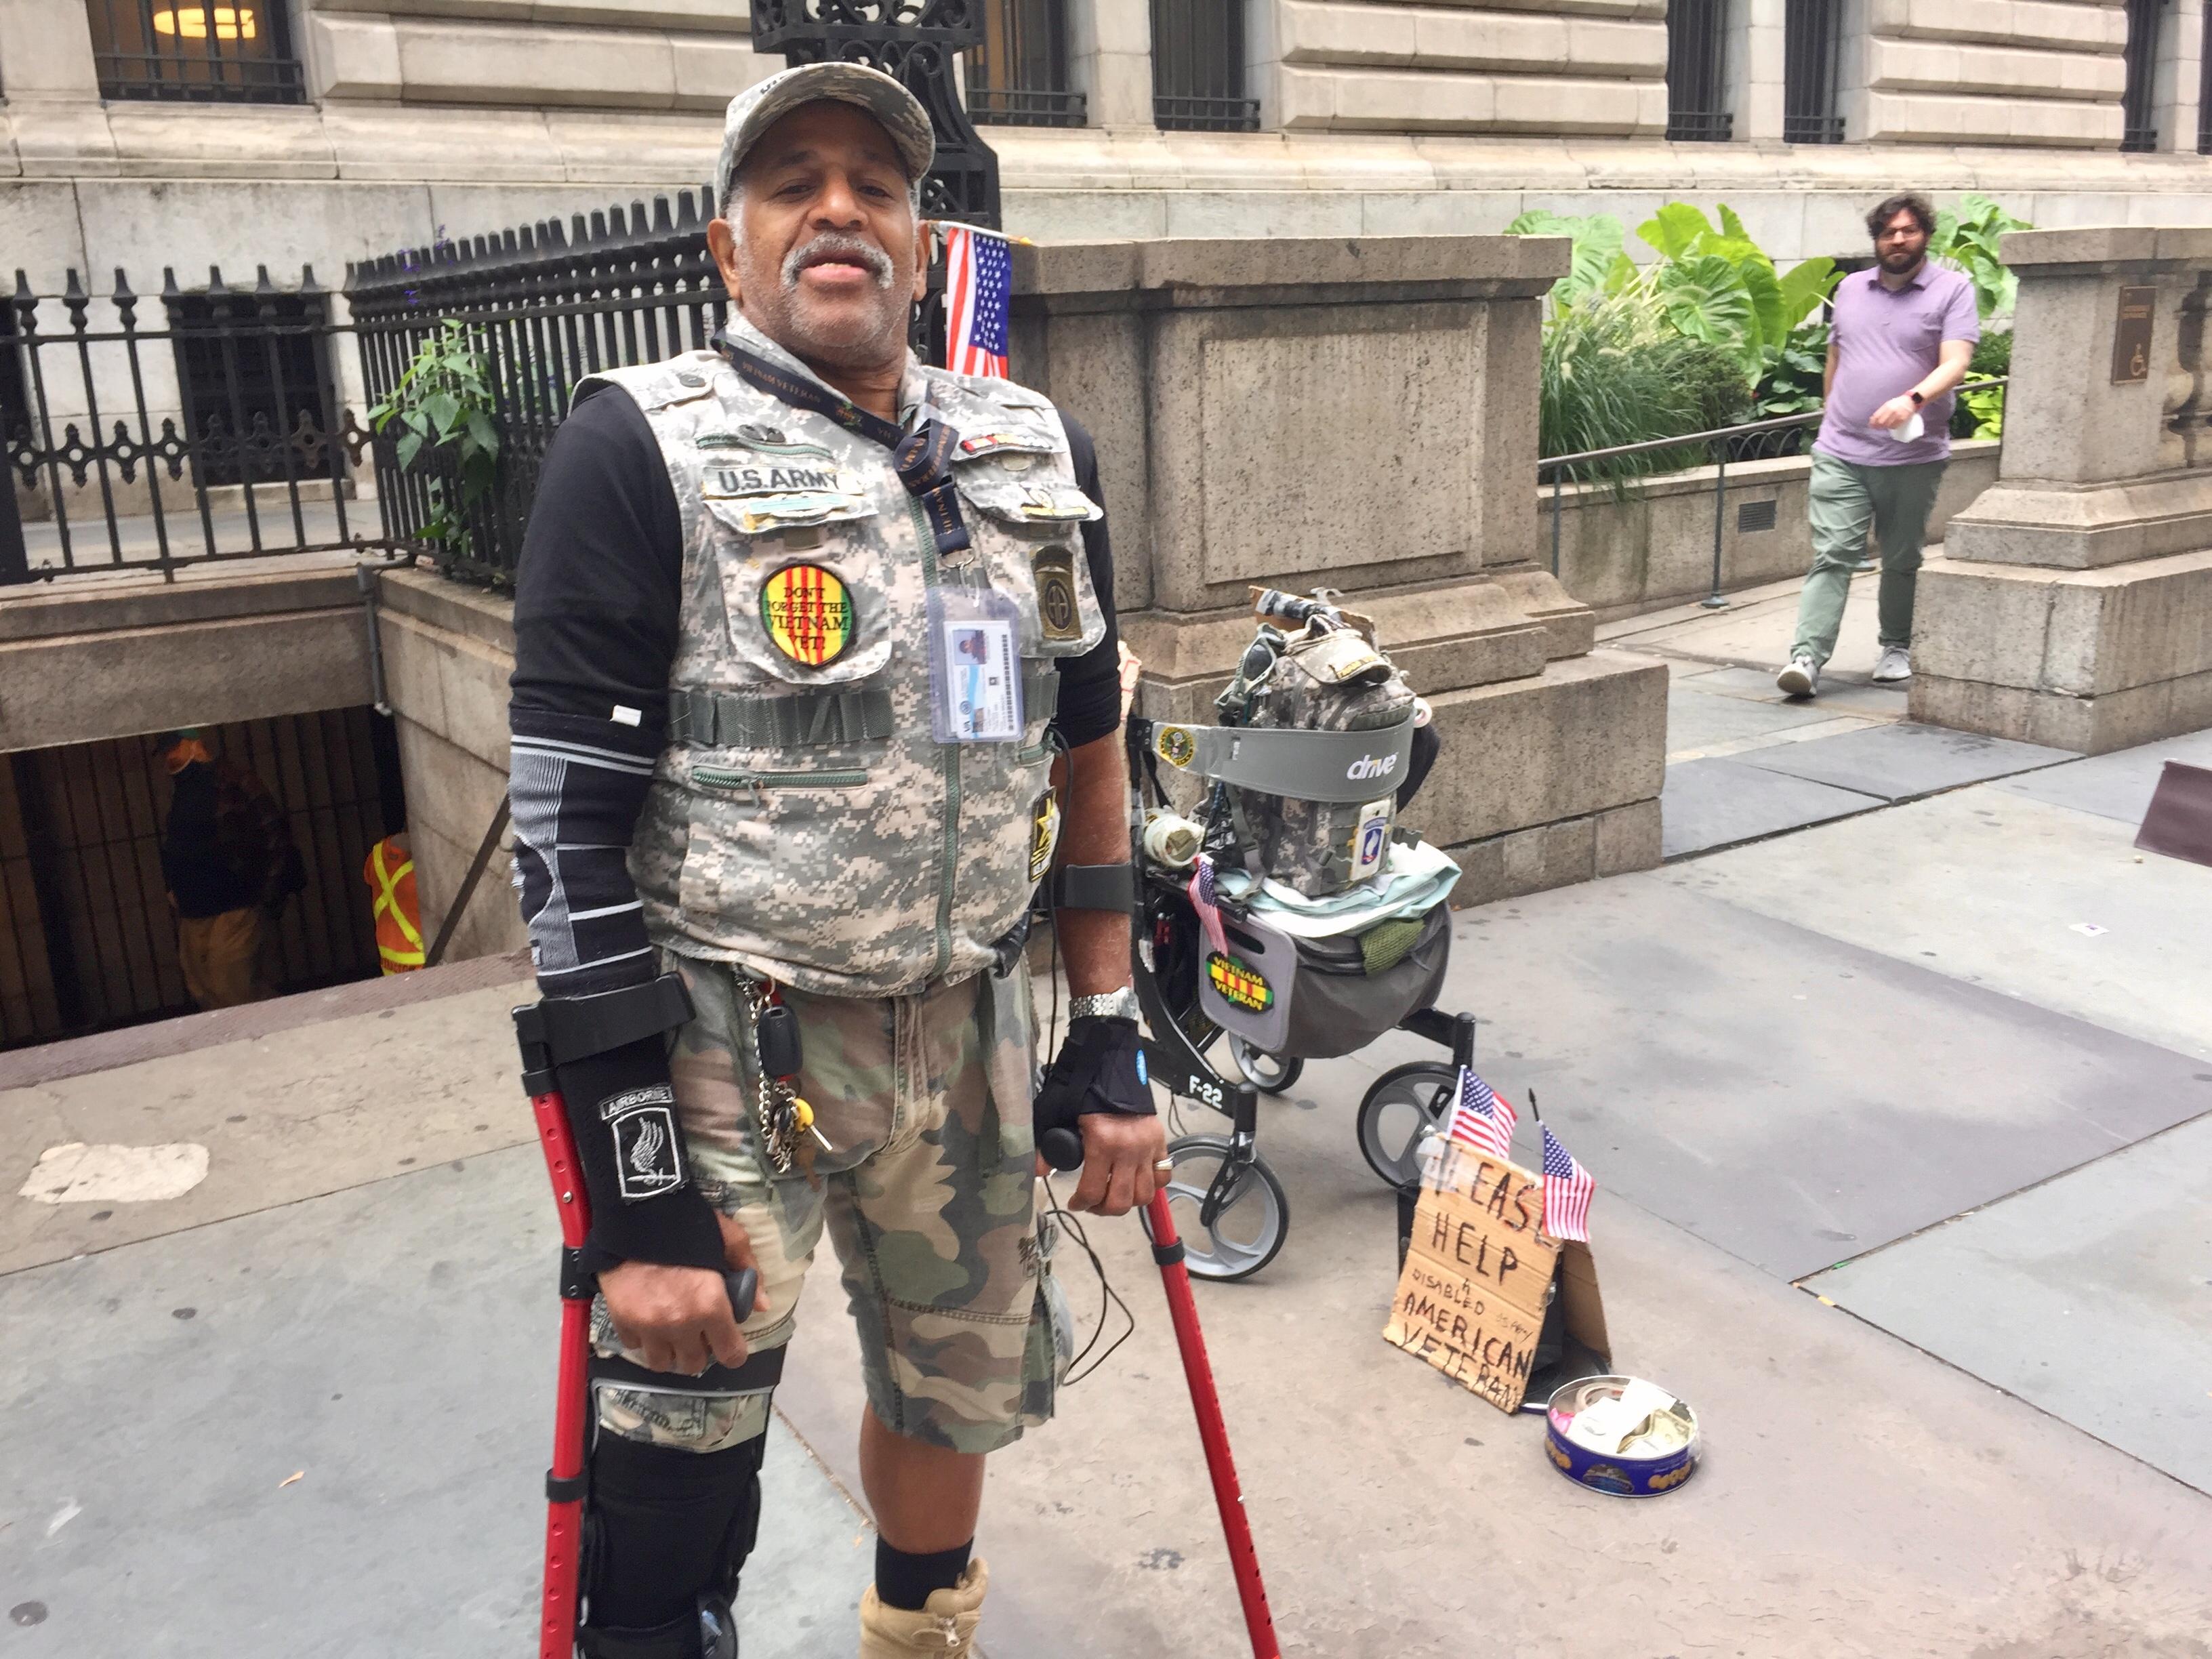 A man wearing a flak jacket and shorts, using crutches